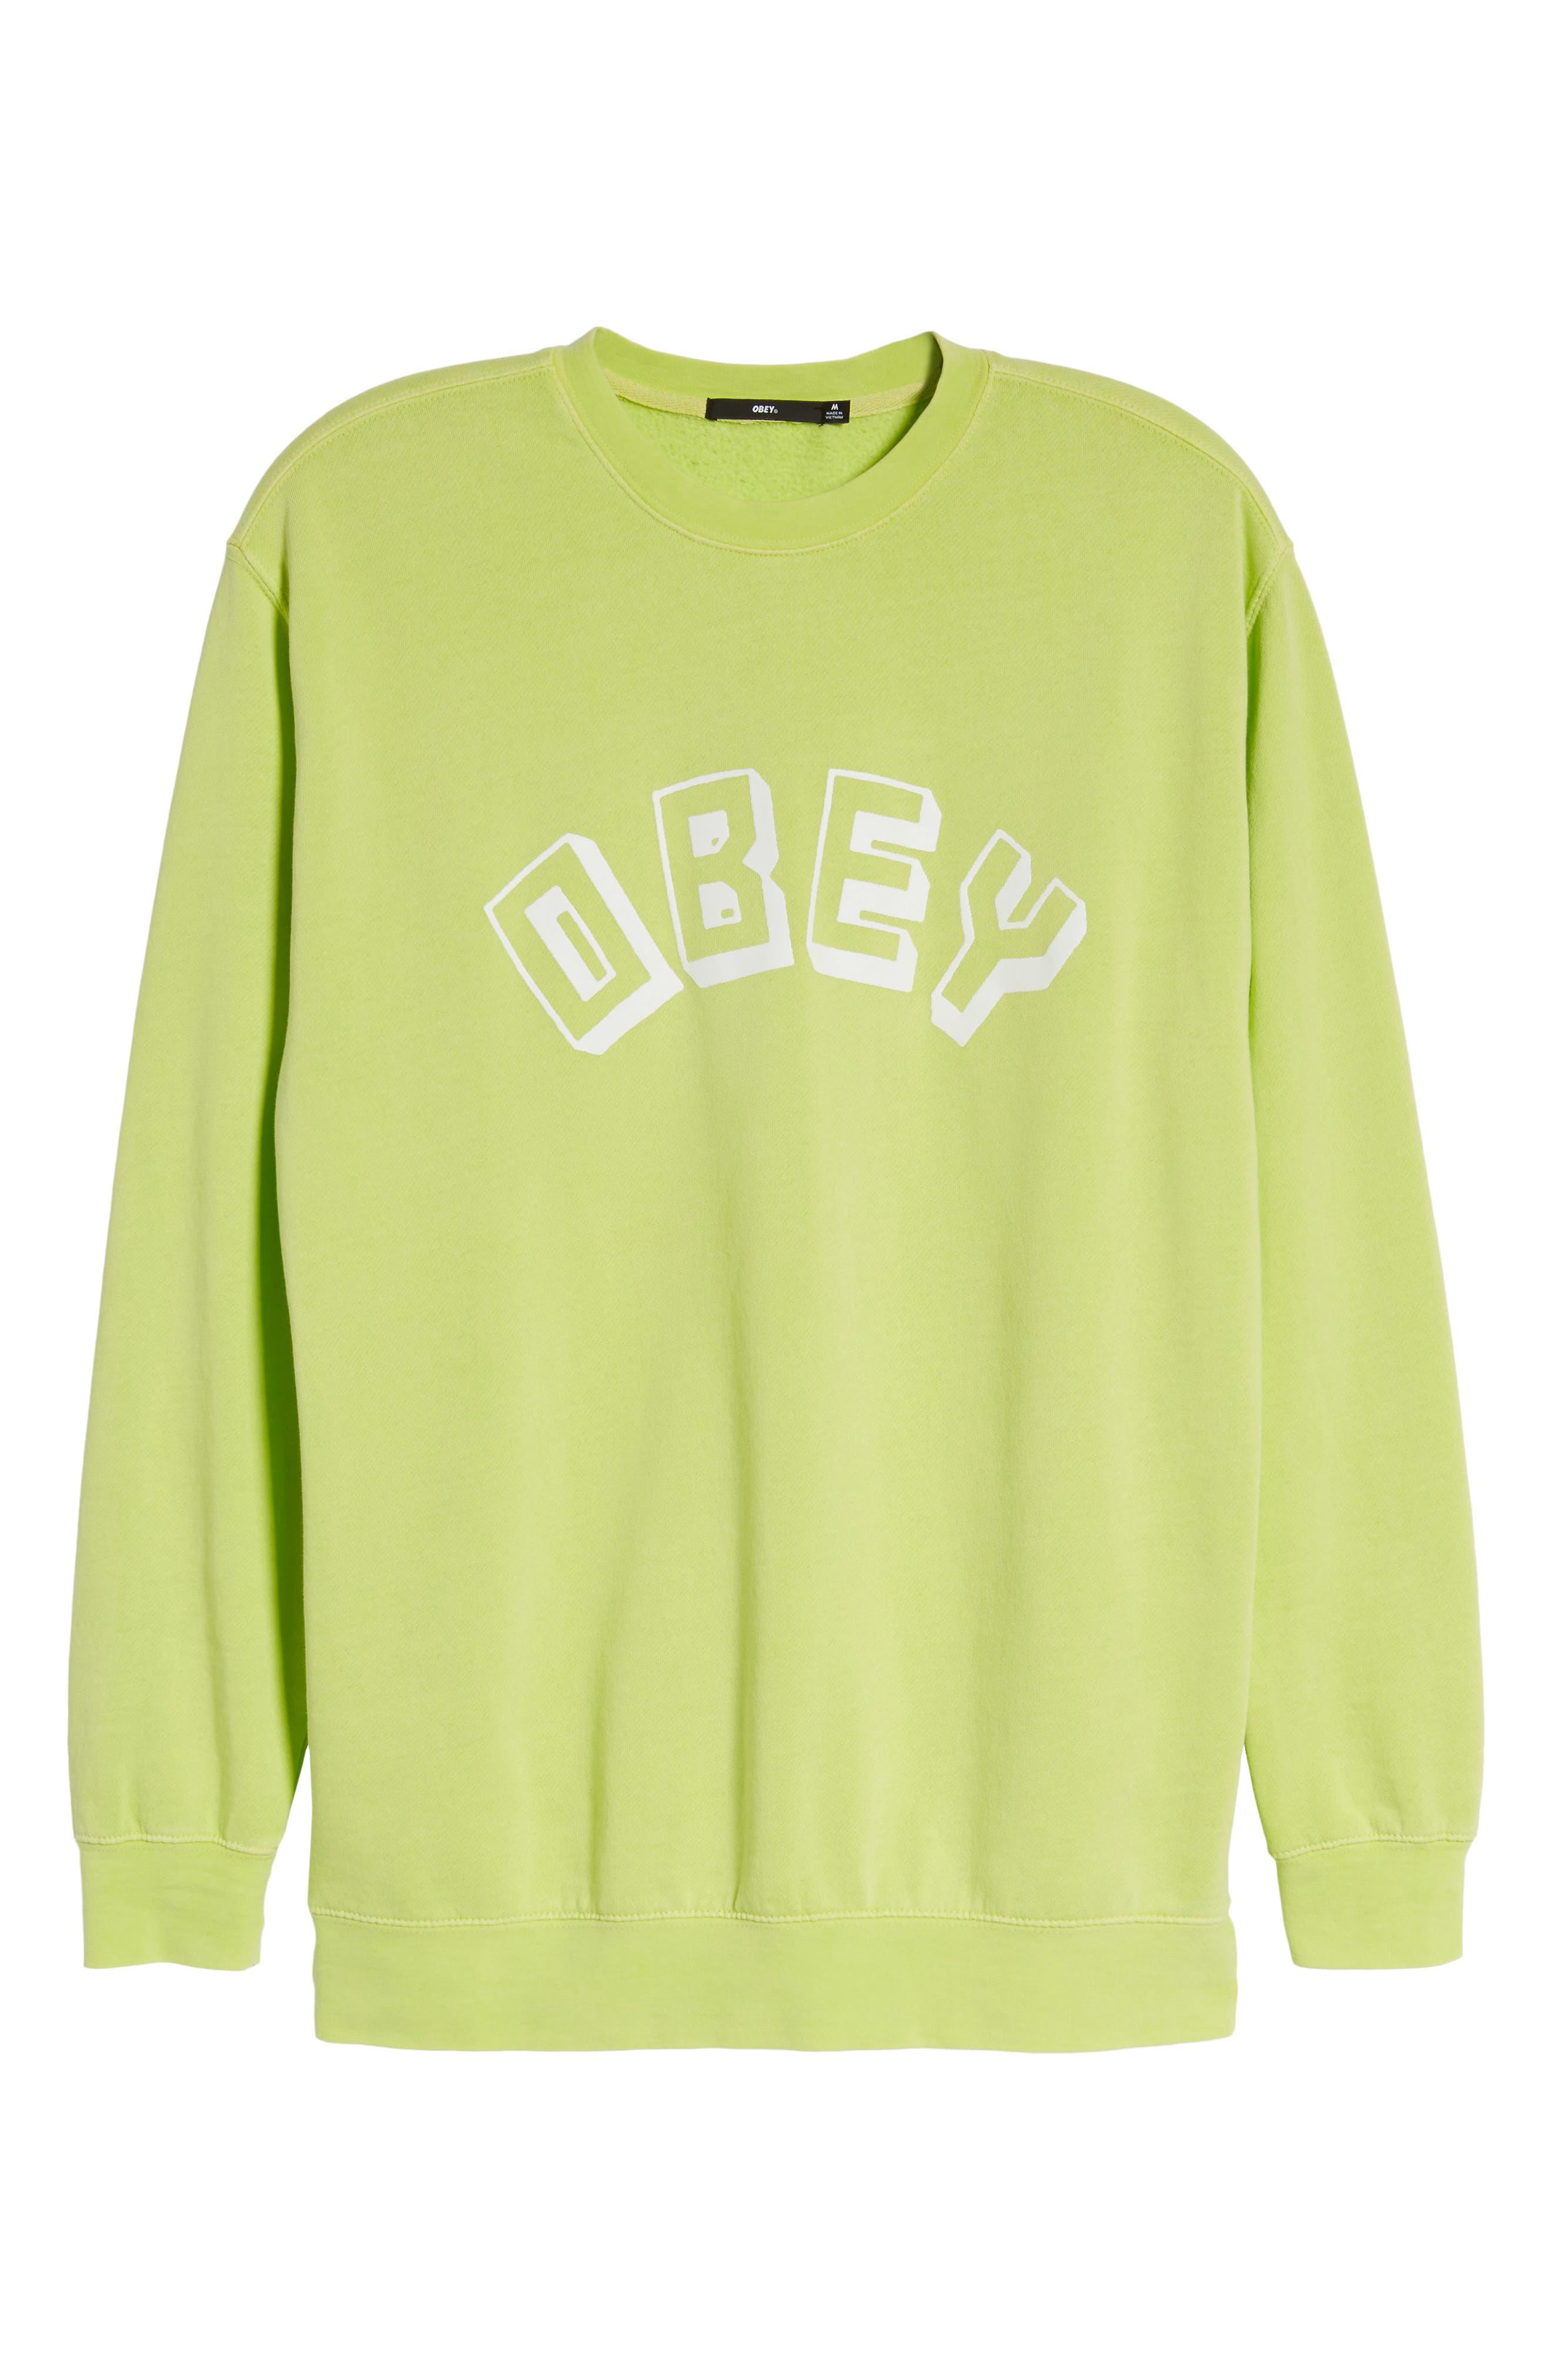 New World Sweatshirt,                             Alternate thumbnail 6, color,                             Dusty Mint